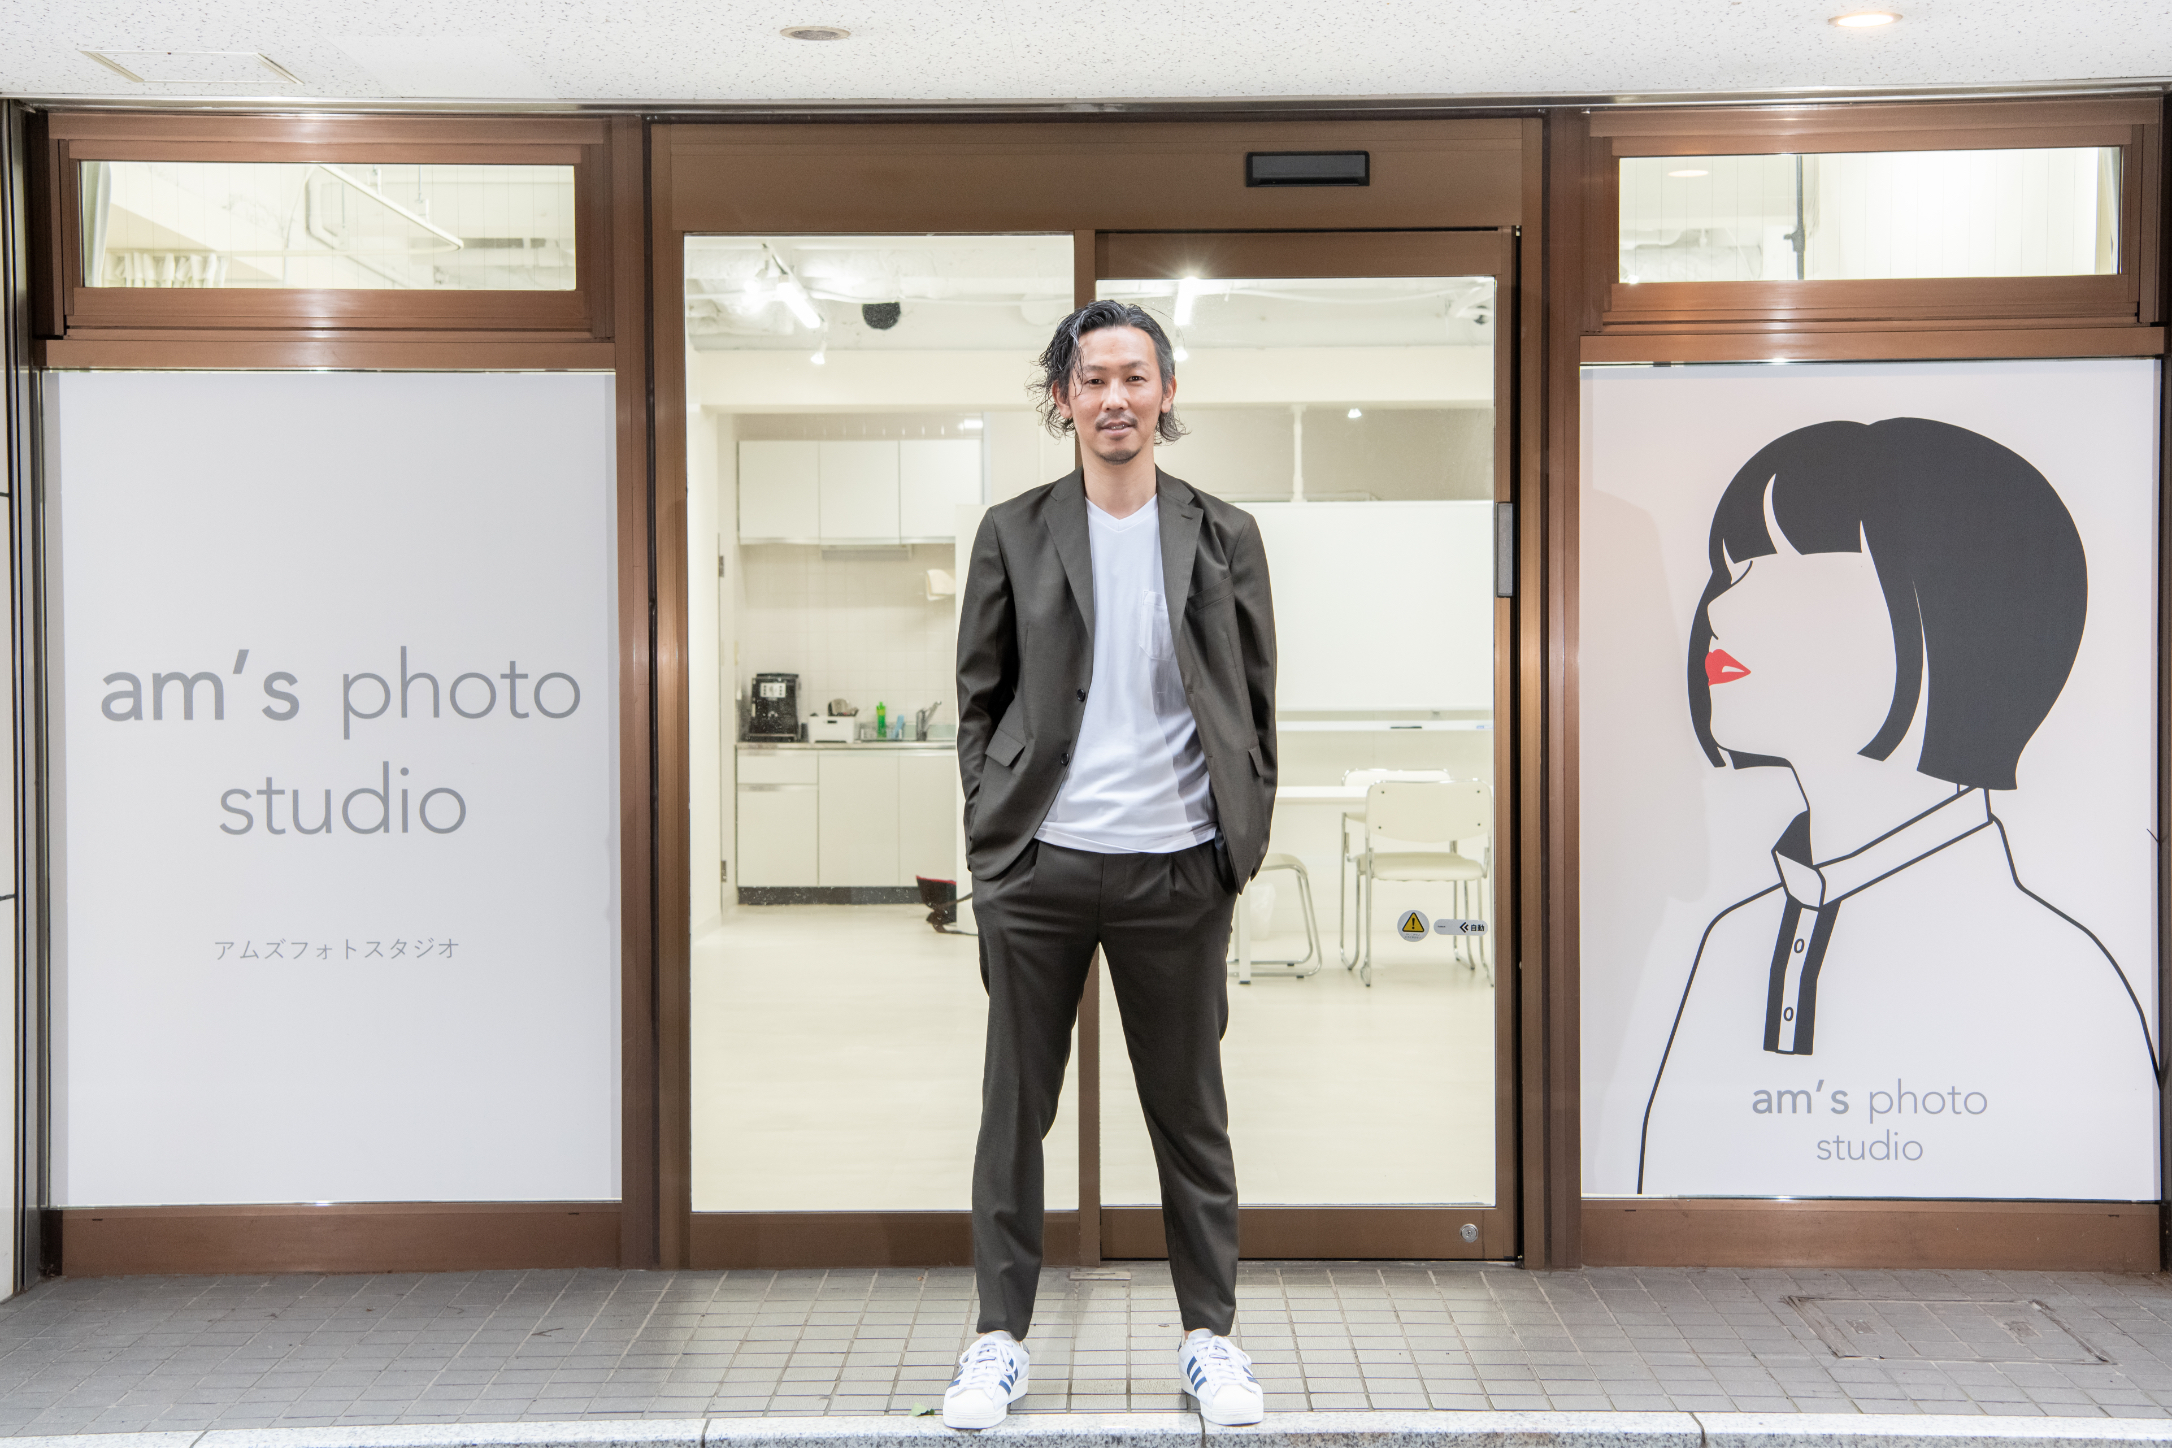 am's photo代表 フォトグラファー 坂本 宏志